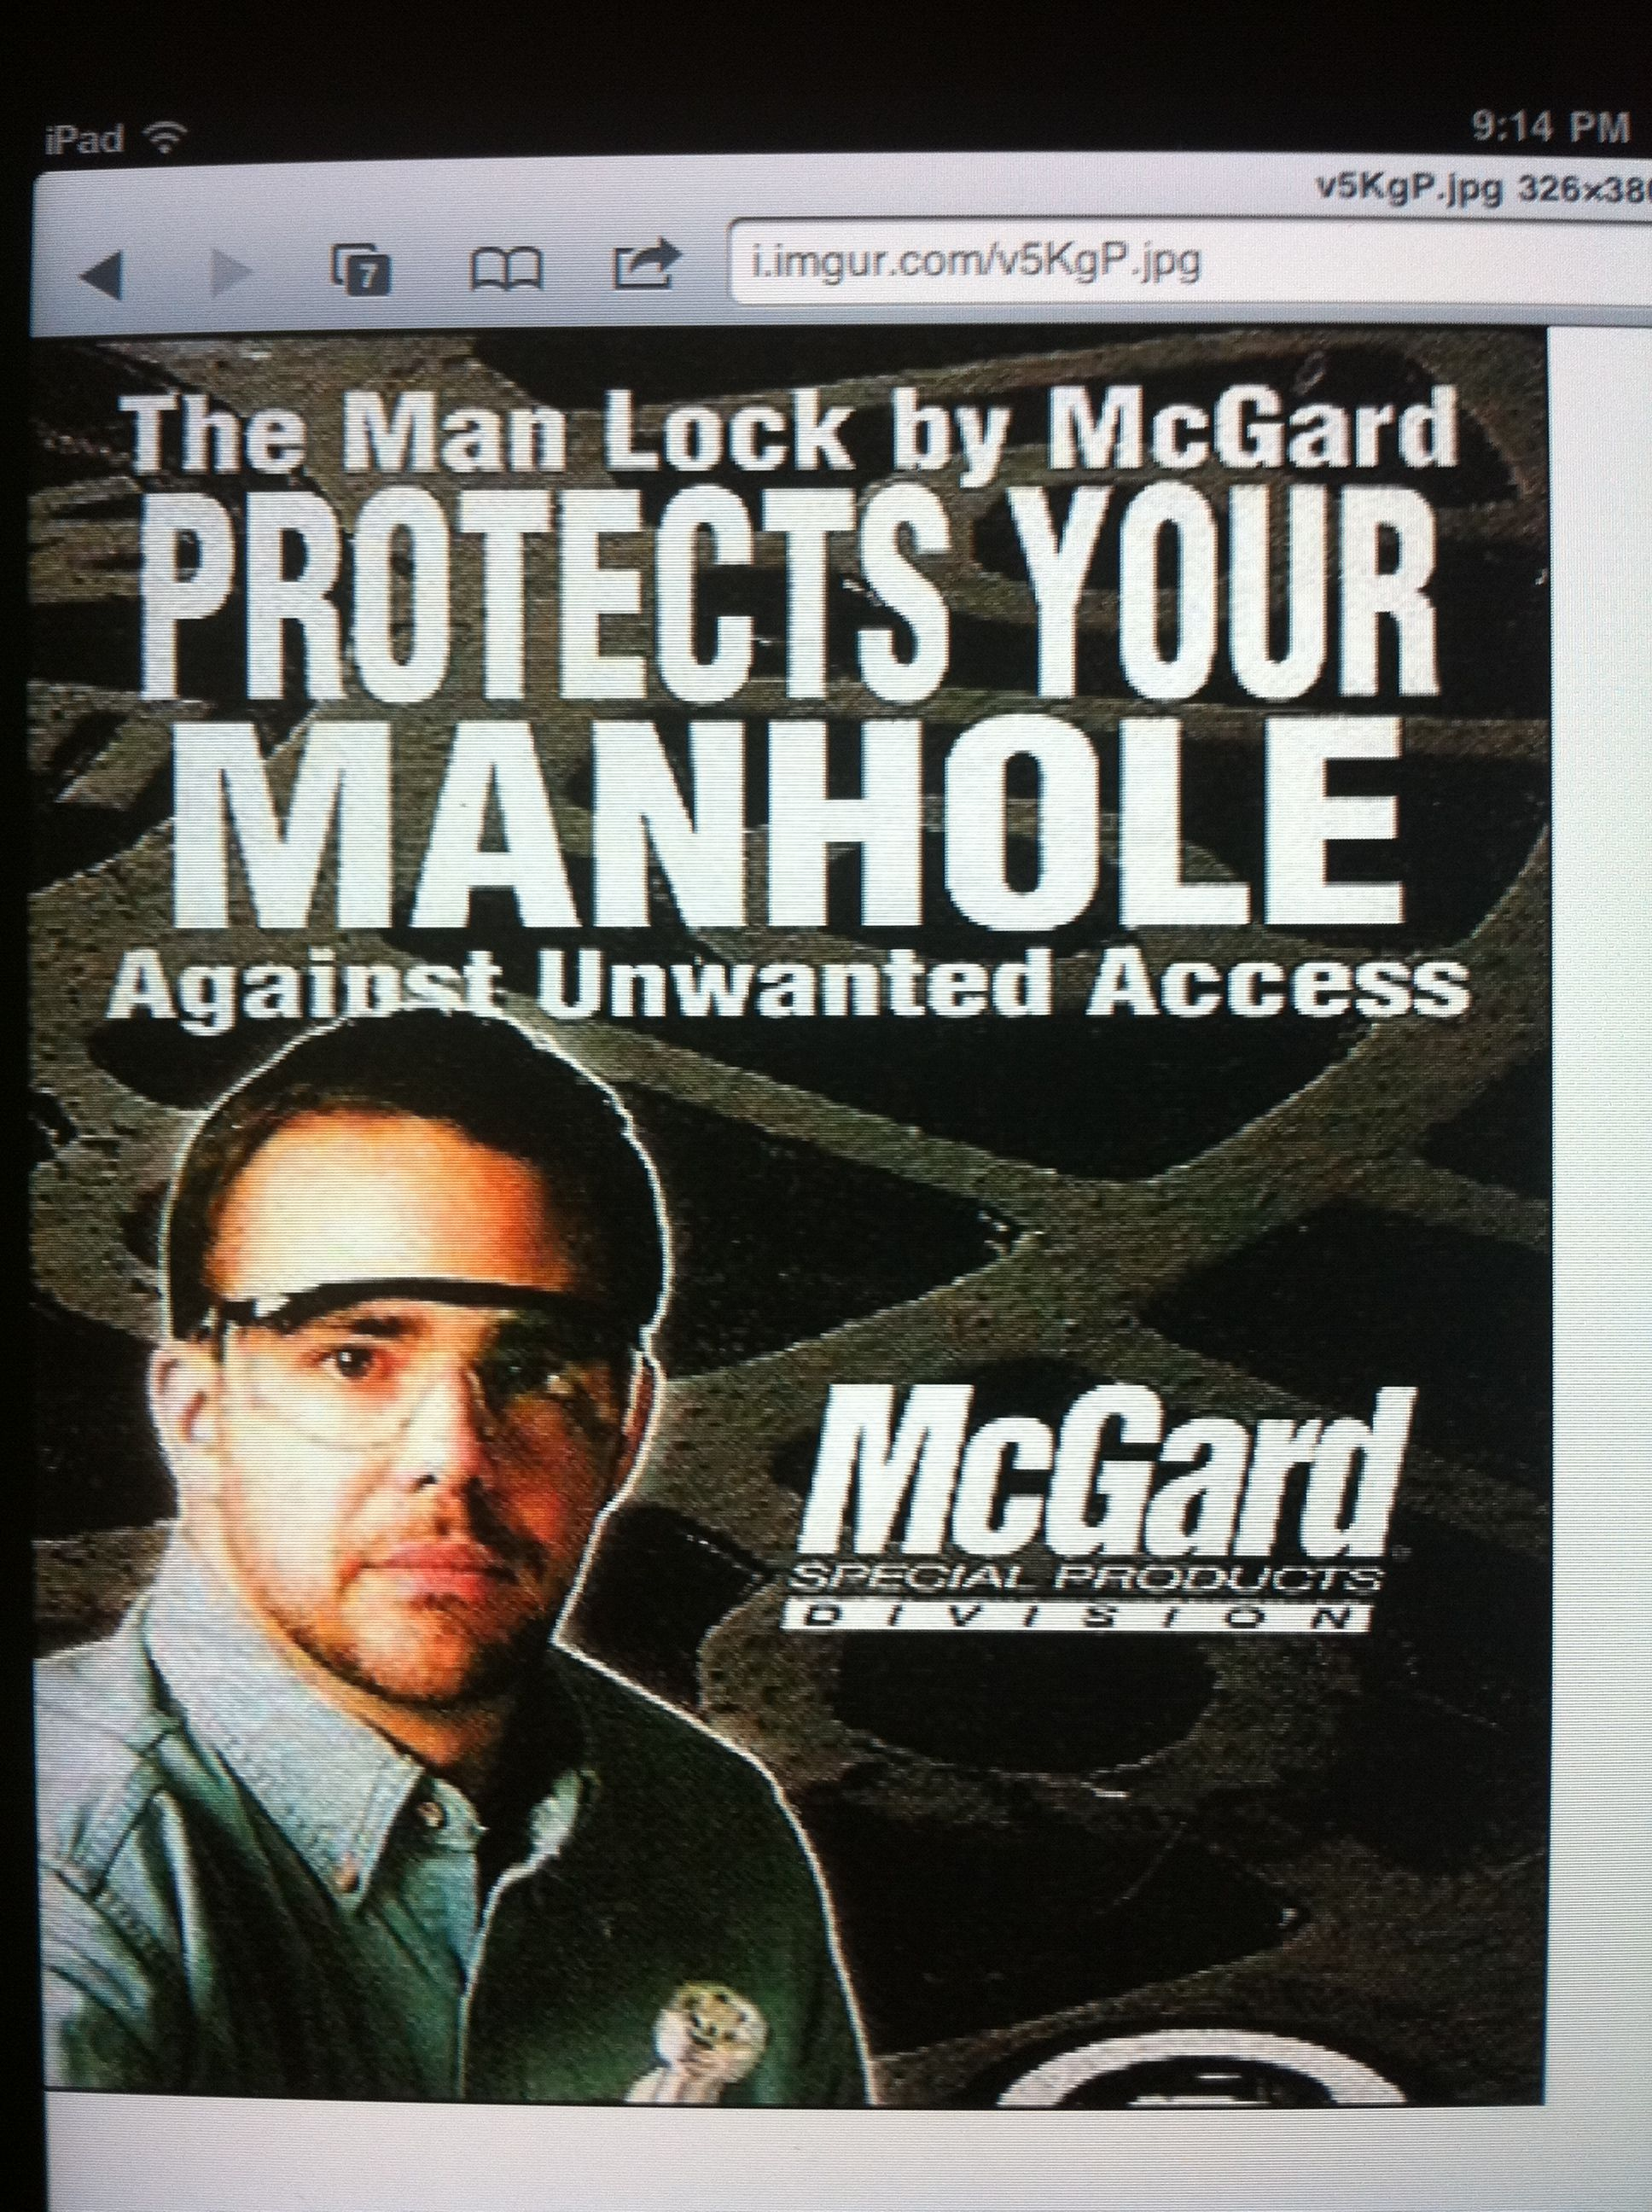 McGard Manhole Protection